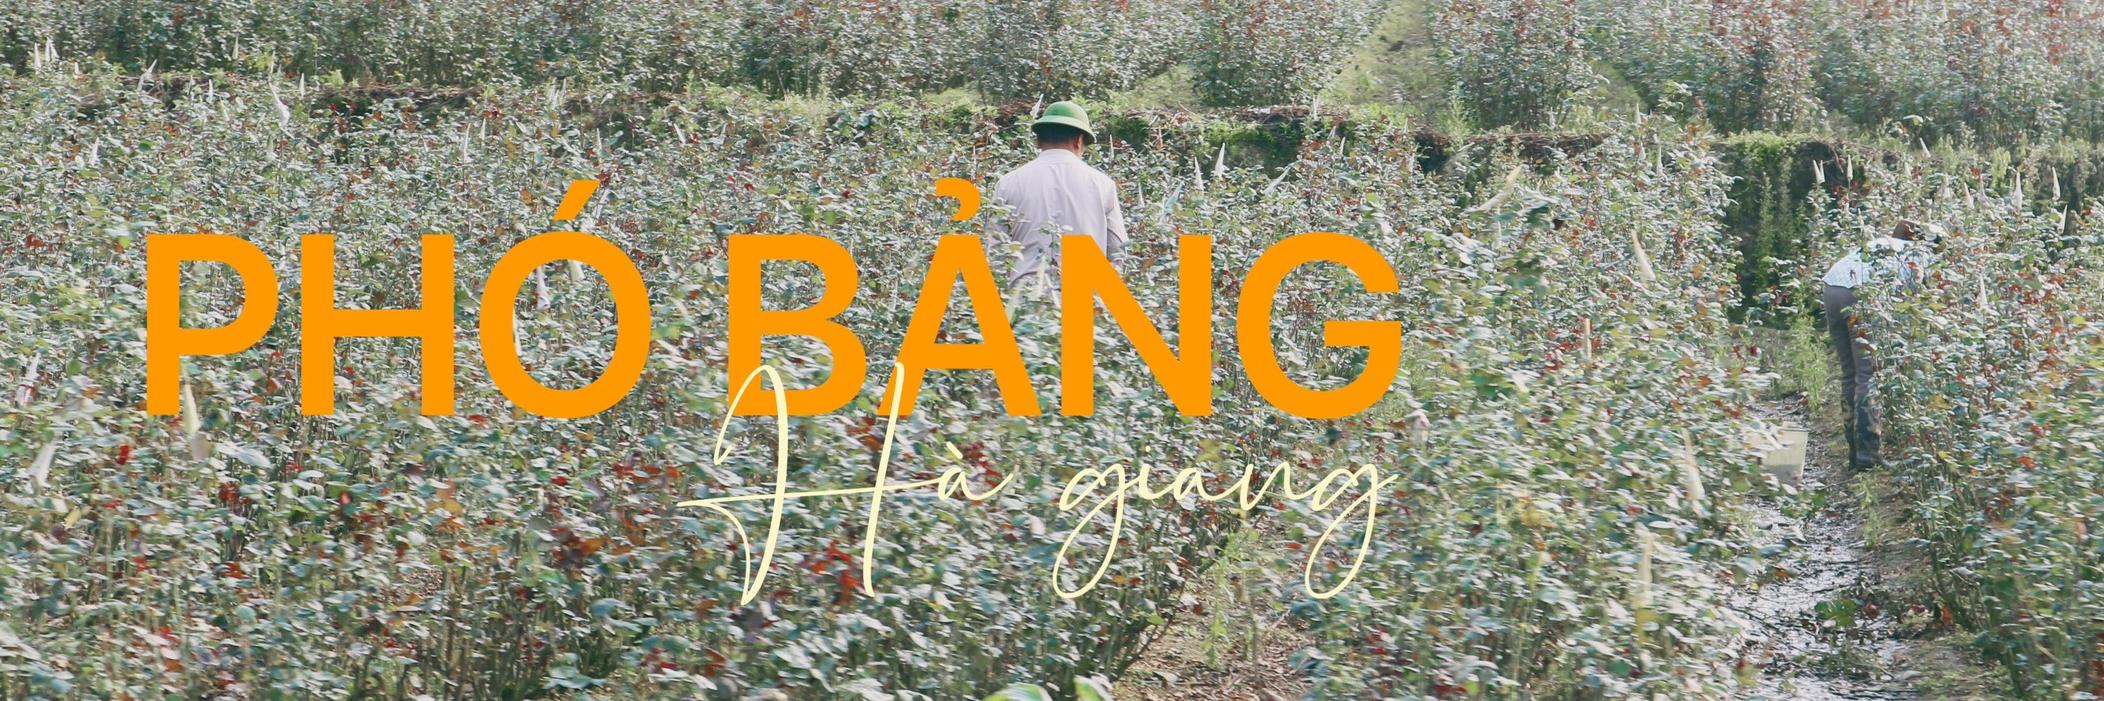 https://gody.vn/blog/nguyenhong97.neu6512/post/pho-bang-noi-co-nhung-net-dep-dung-la-khong-giong-bat-cu-noi-nao-8430